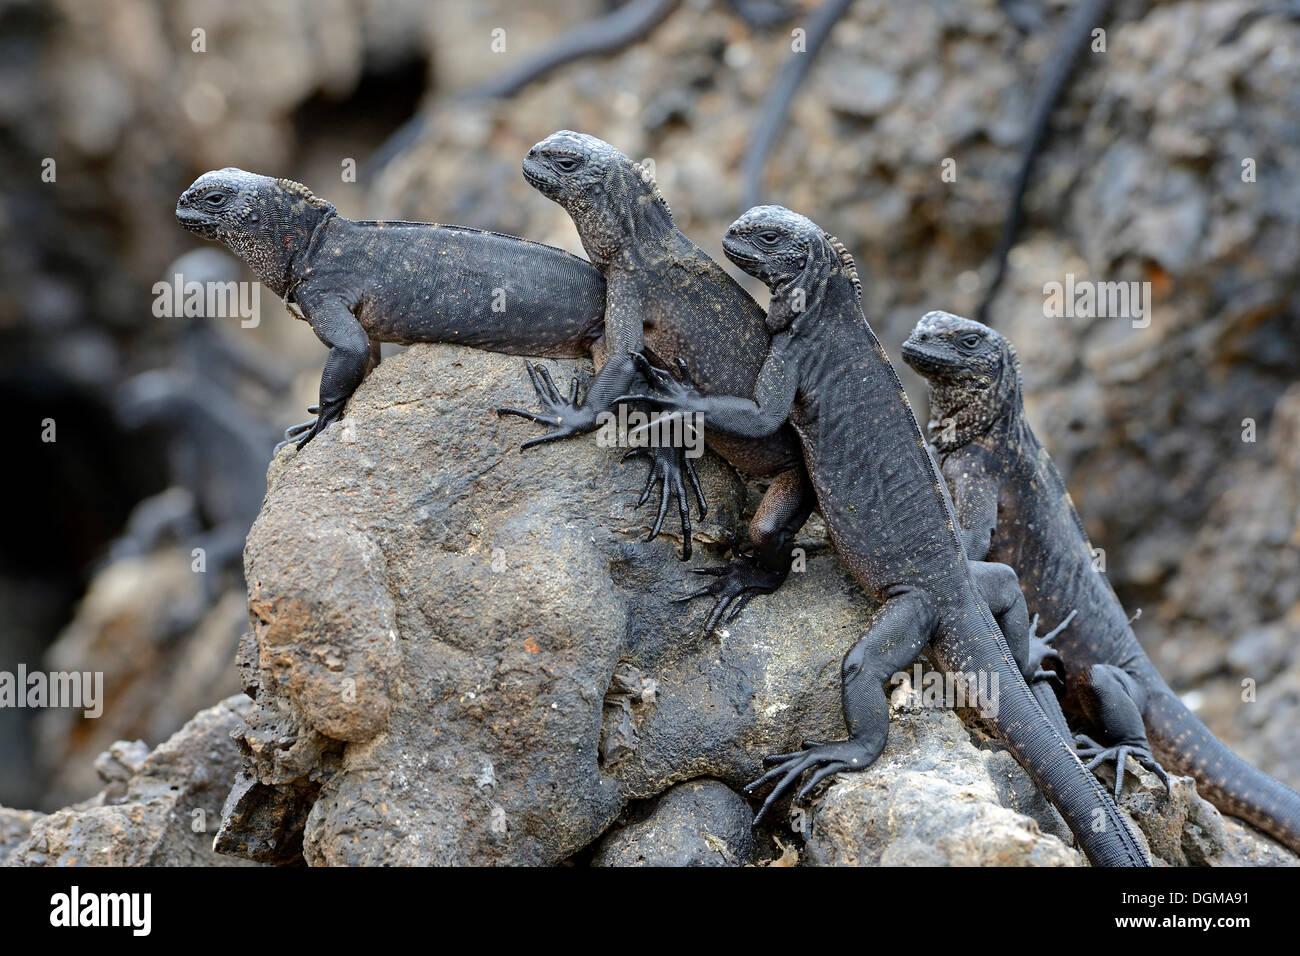 Marine Iguanas (Amblyrhynchus cristatus), subspecies from Isabela Island, Galapagos Islands, UNESCO World Natural Heritage Site - Stock Image